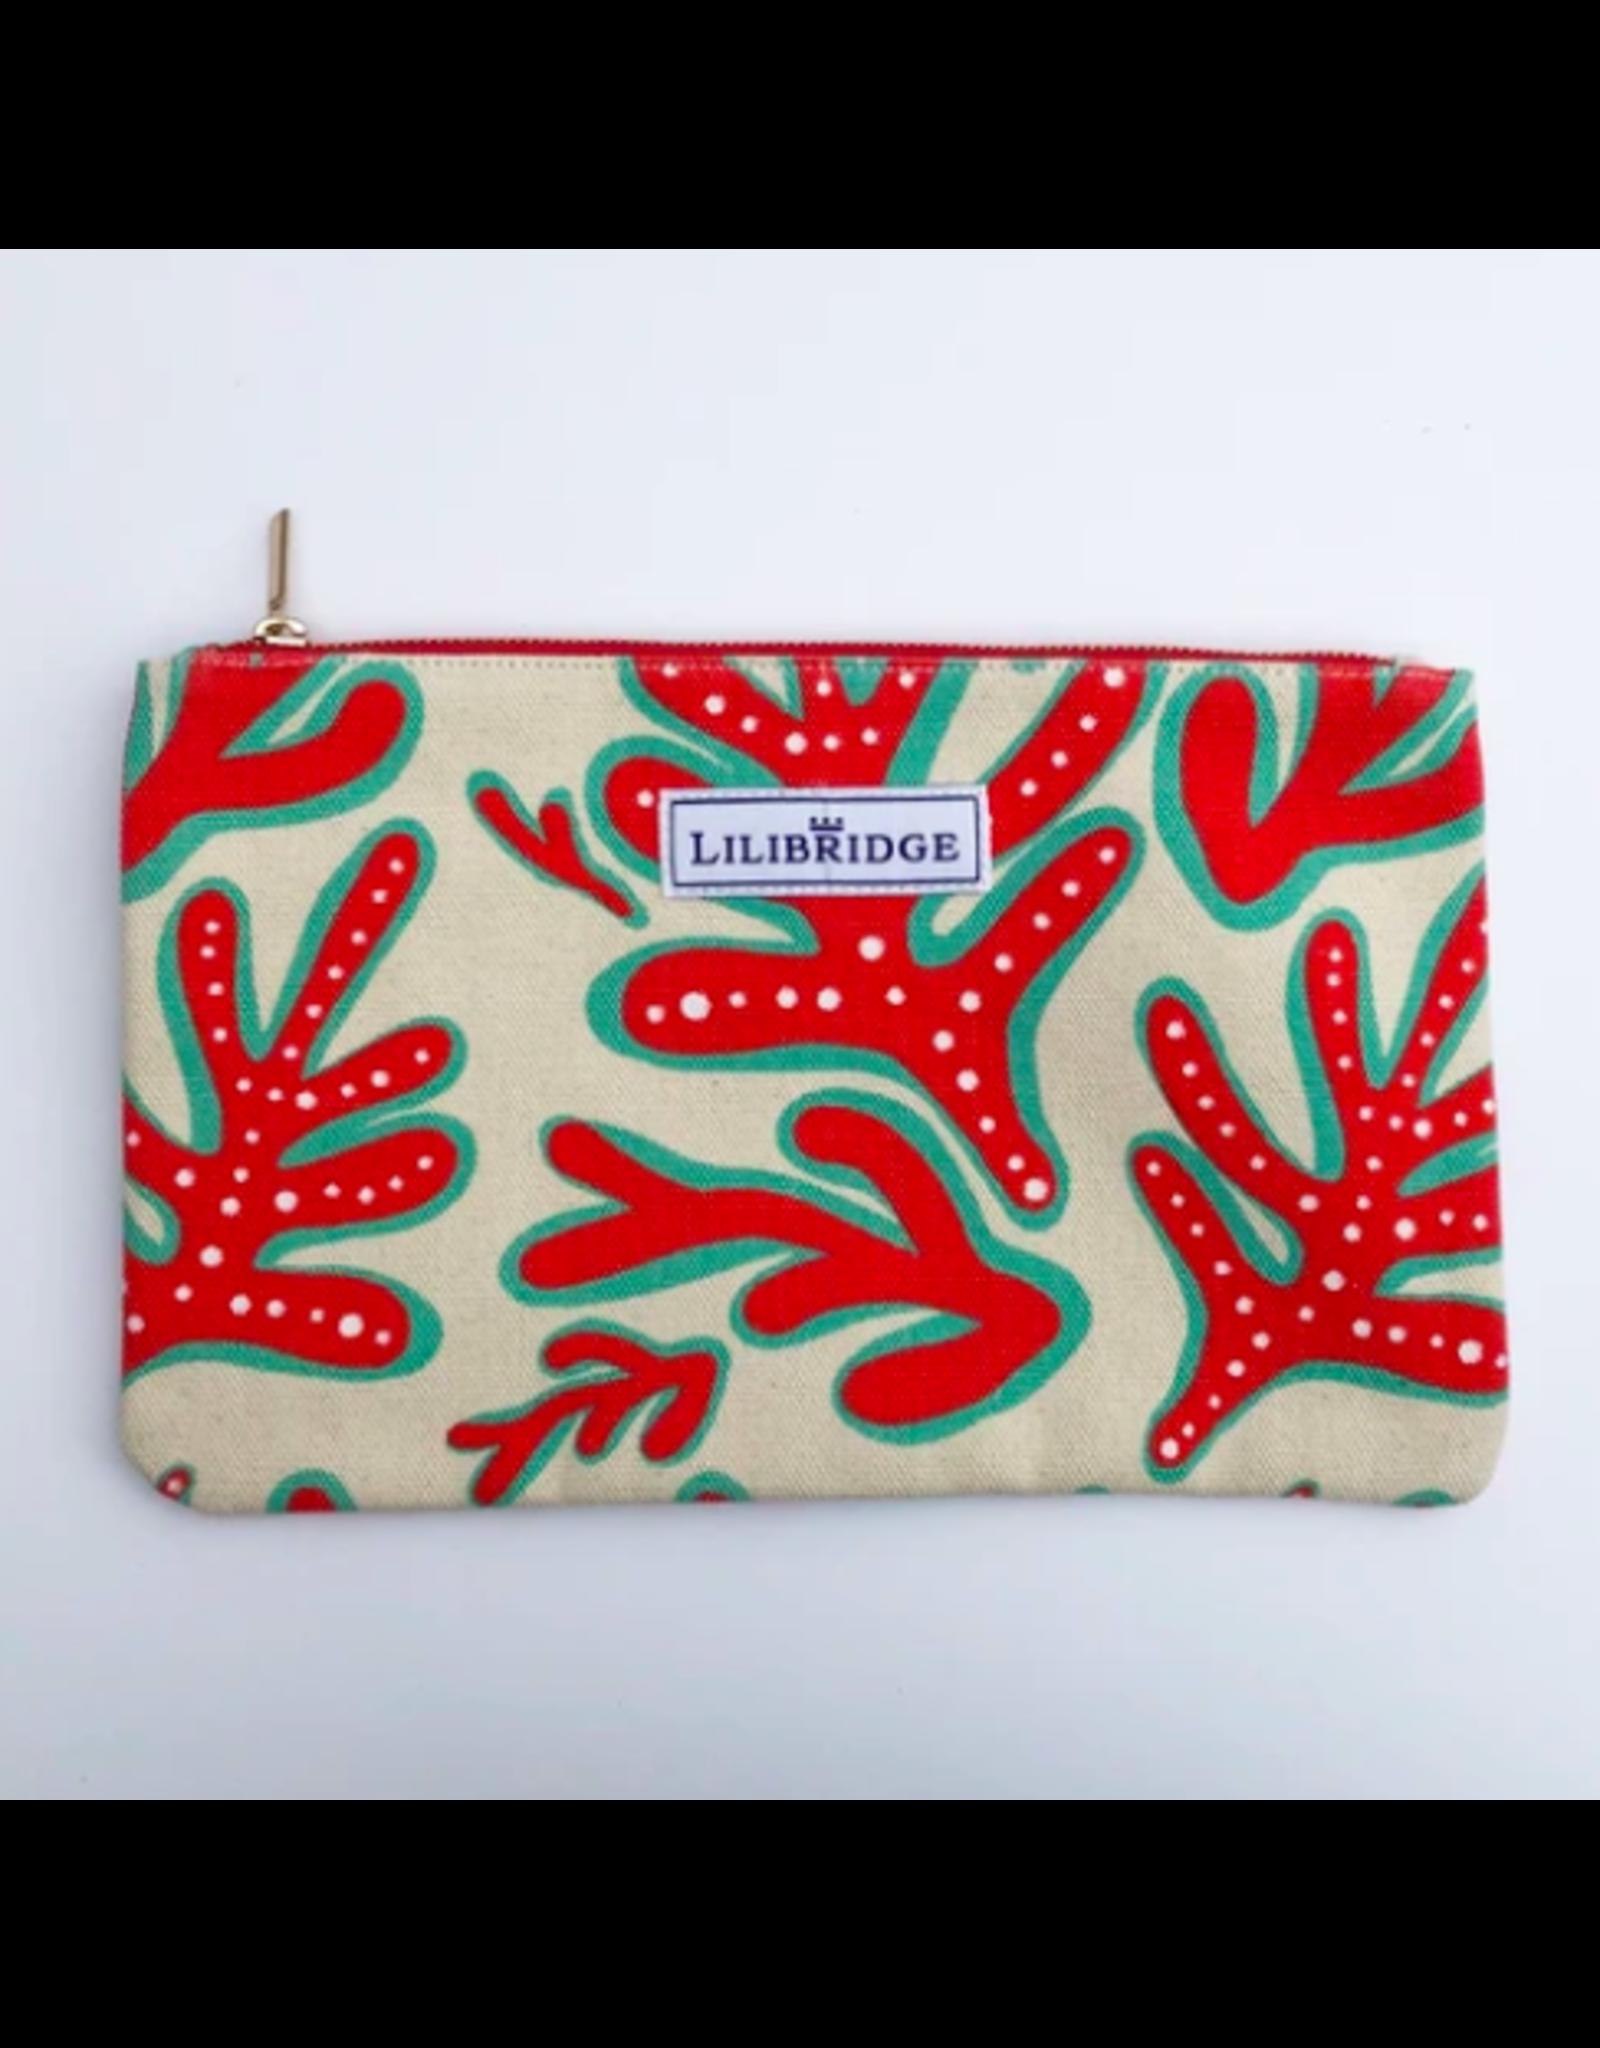 Lilibridge Crazy Coral Clutch by Lilibridge